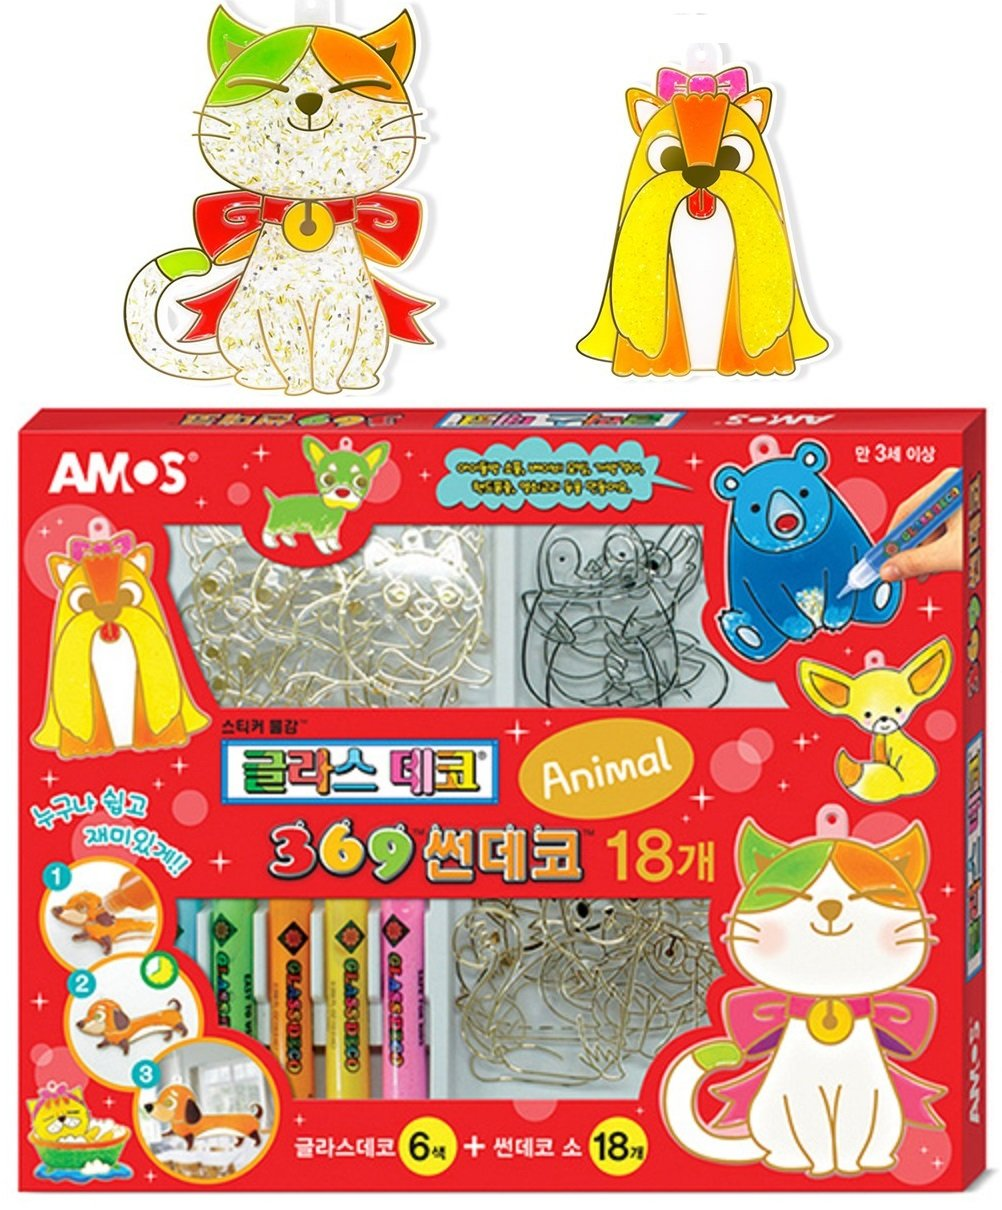 Korean AMOS Suncatcher Mini Stained Glass Kit (18 Animals Cat Puppy Bear Fox Crab and 6 Color Paints) Sun Decor Accessory Easy Boundary Paint